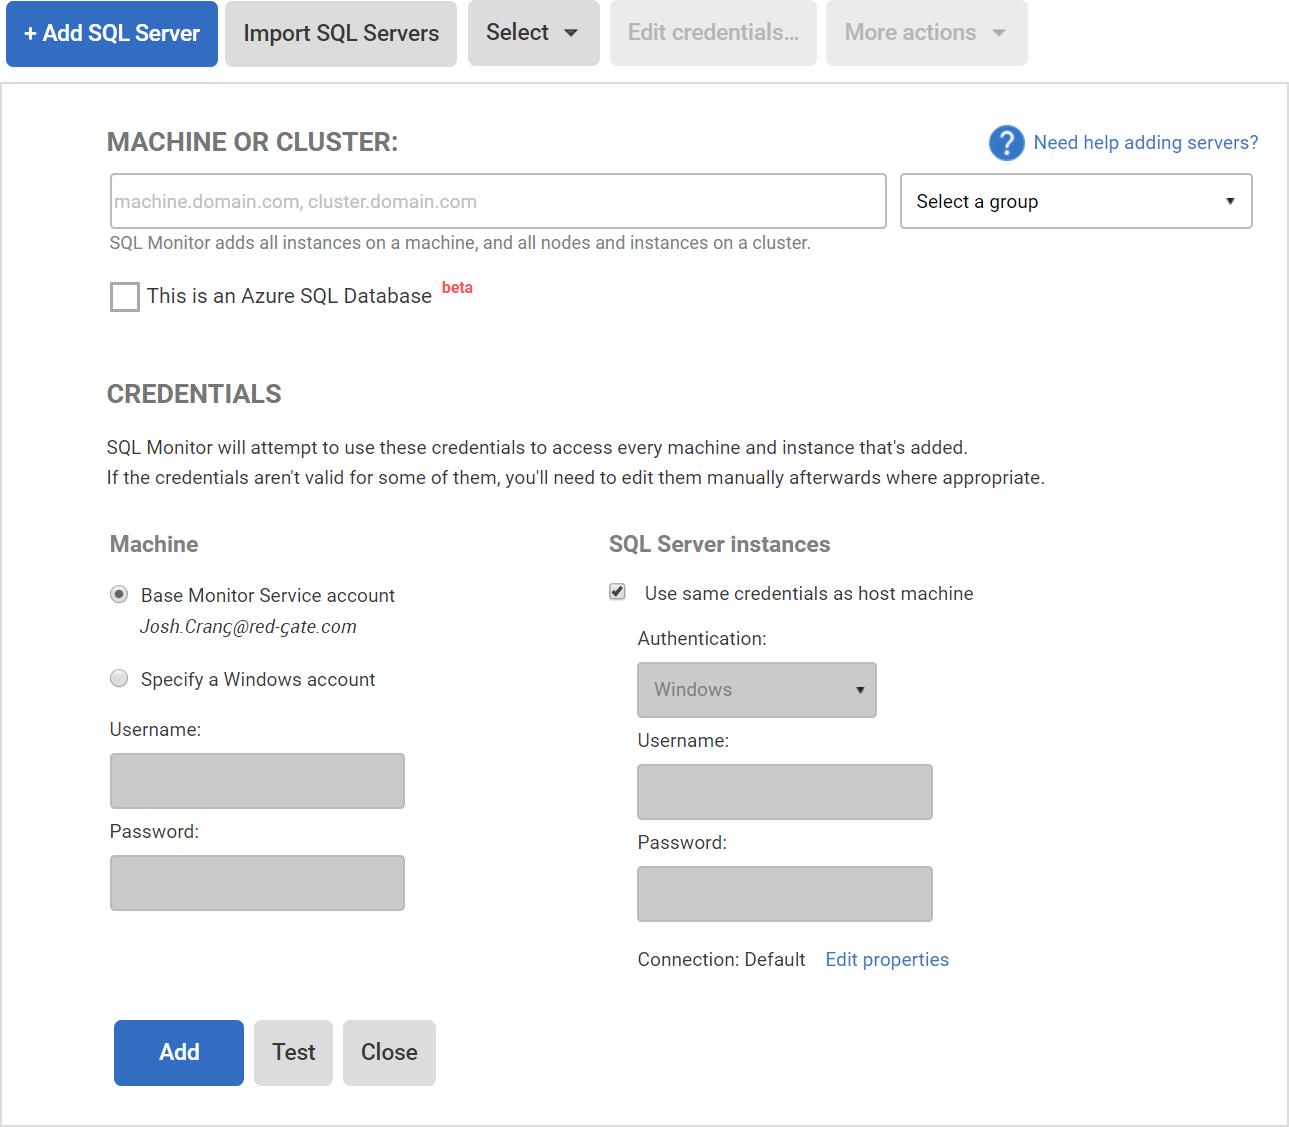 Adding servers to monitor - SQL Monitor 7 - Product Documentation